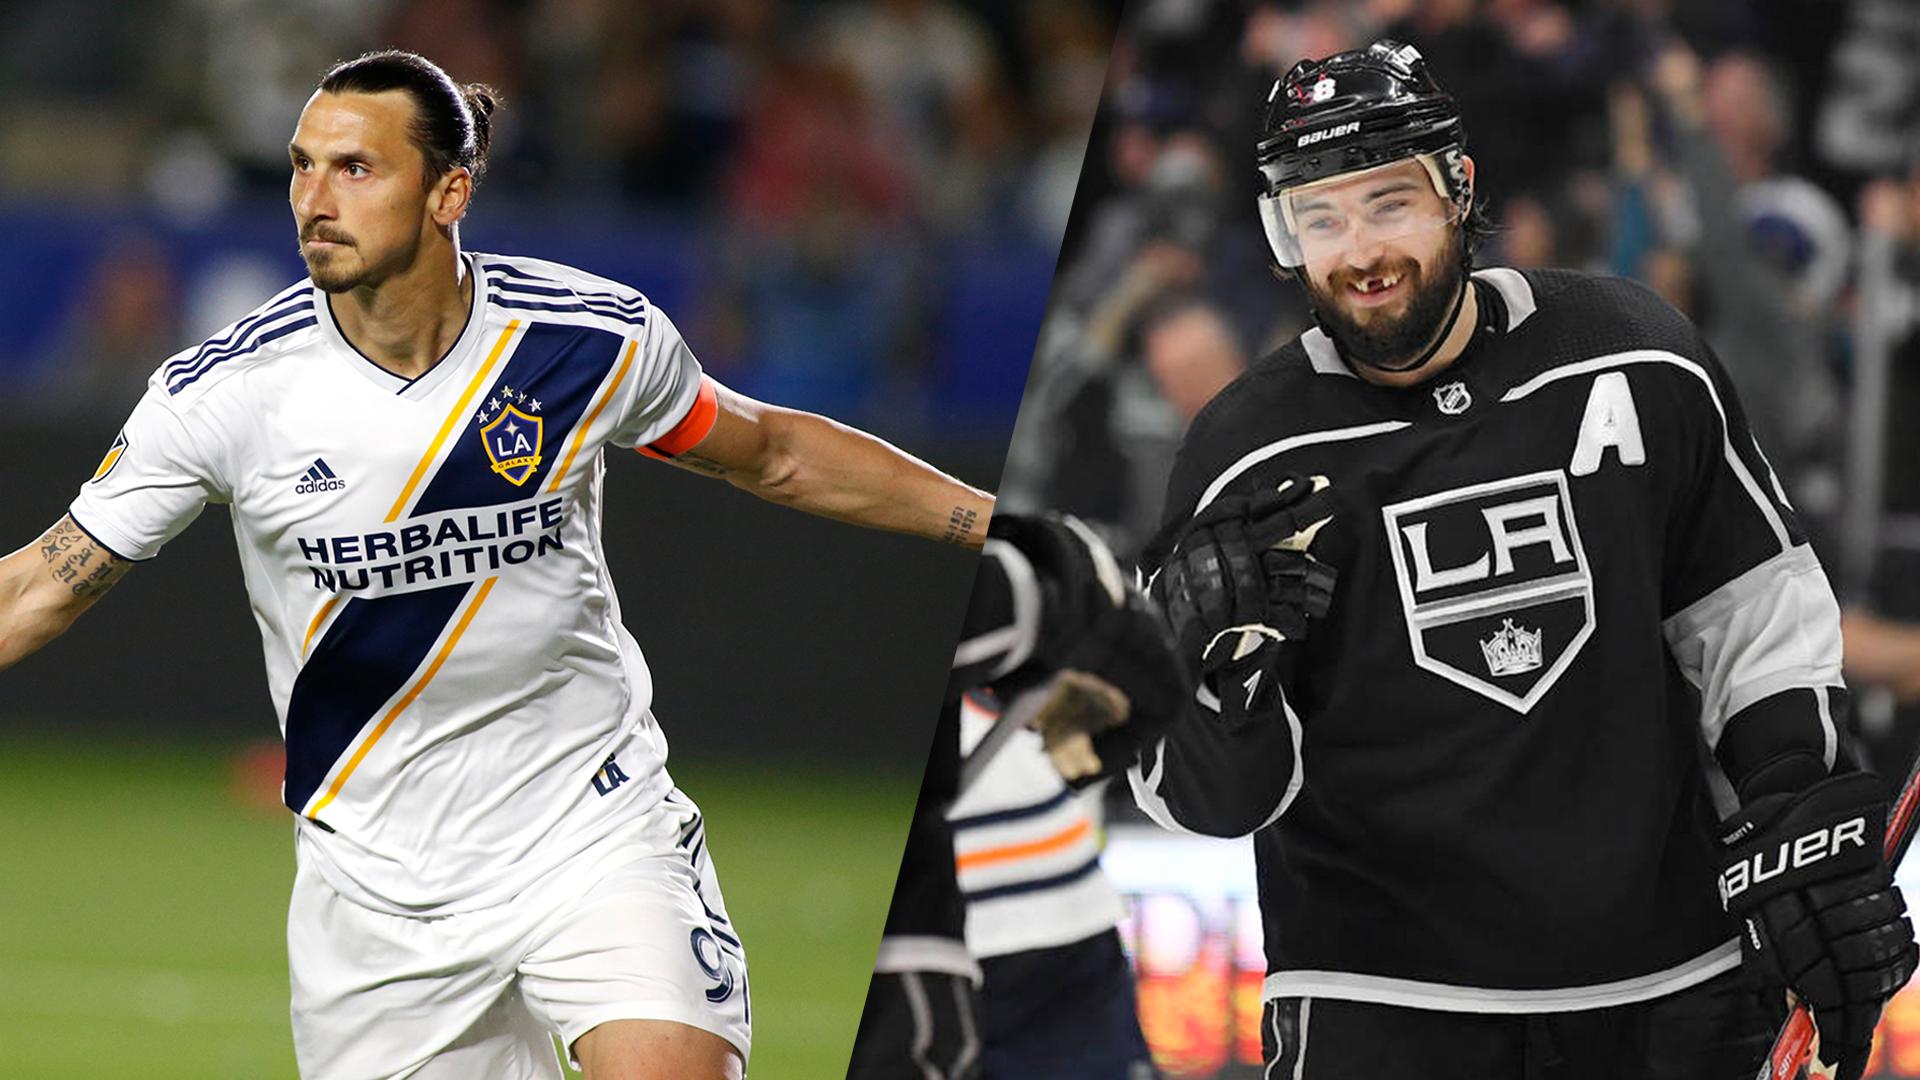 LA Kings, LA Galaxy enter deal with Esports Entertainment Group